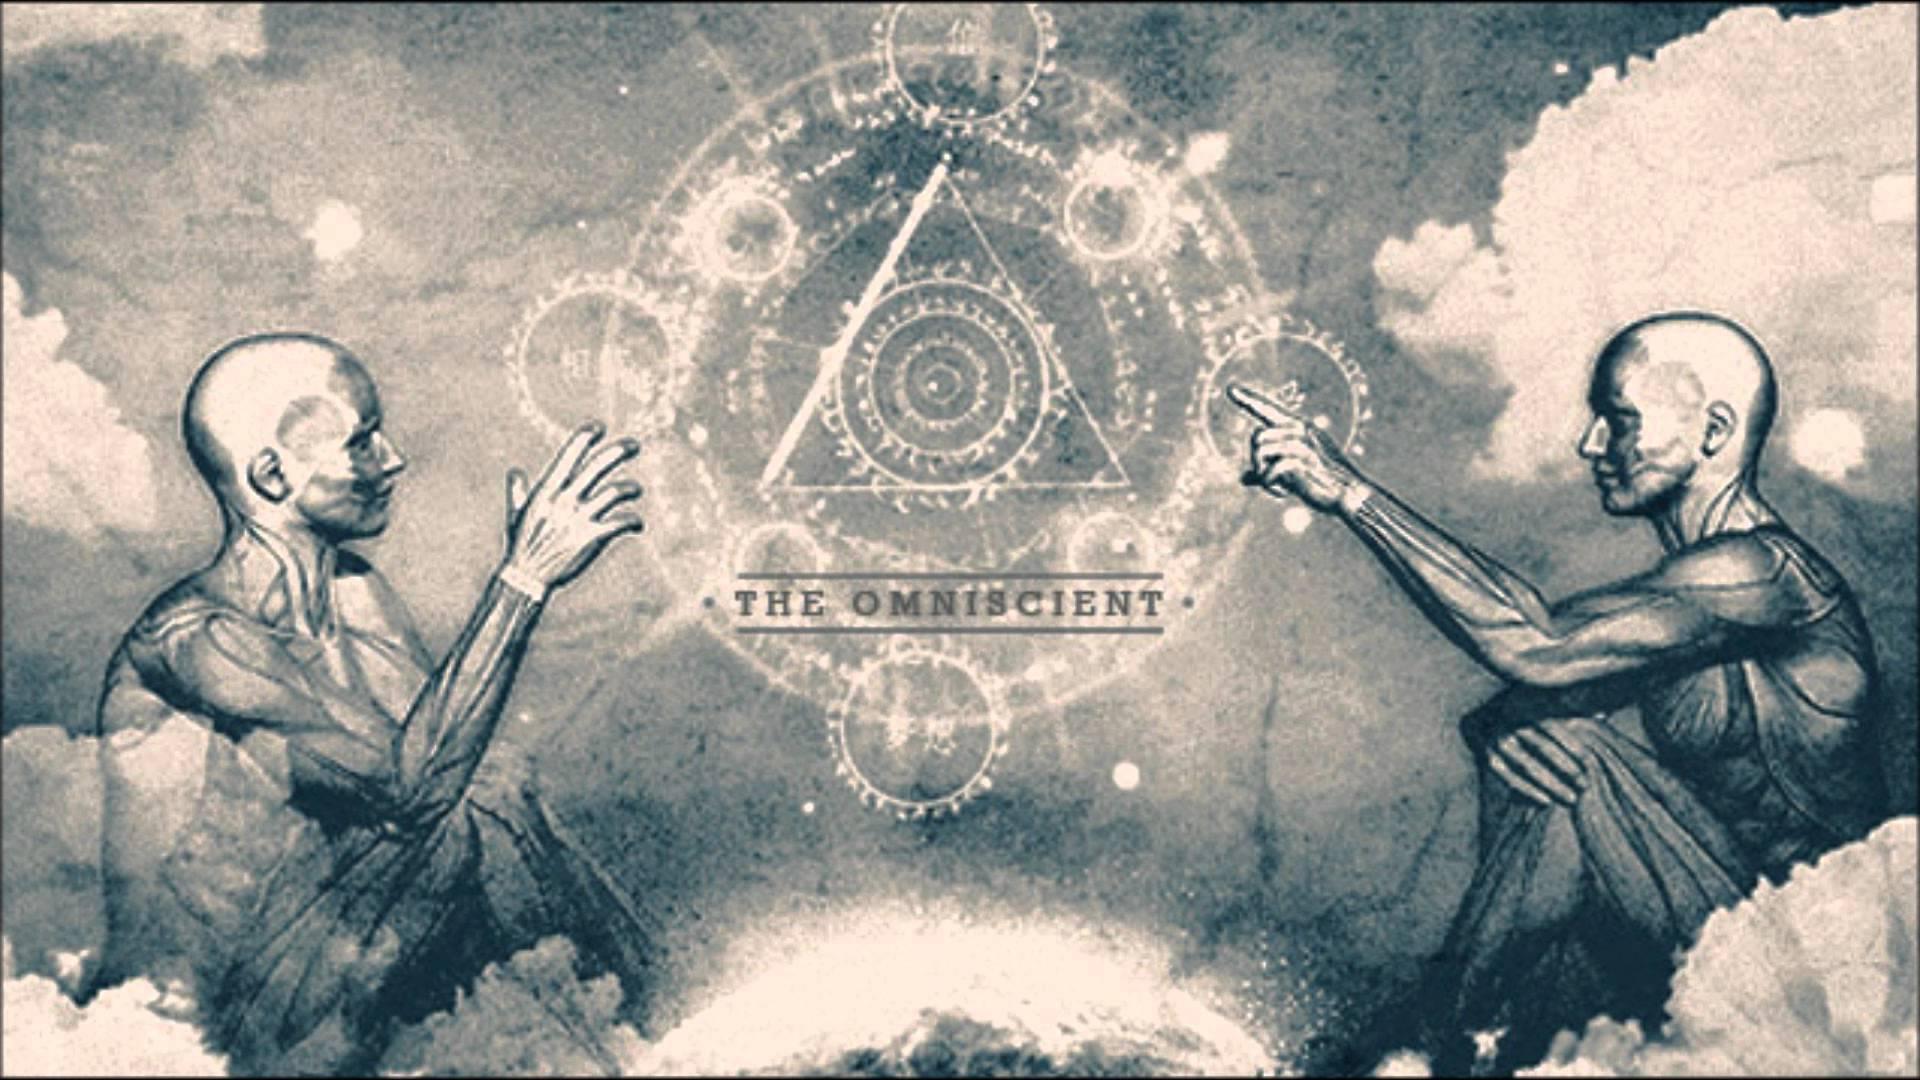 Born Of Osiris - The Omniscient (HD)